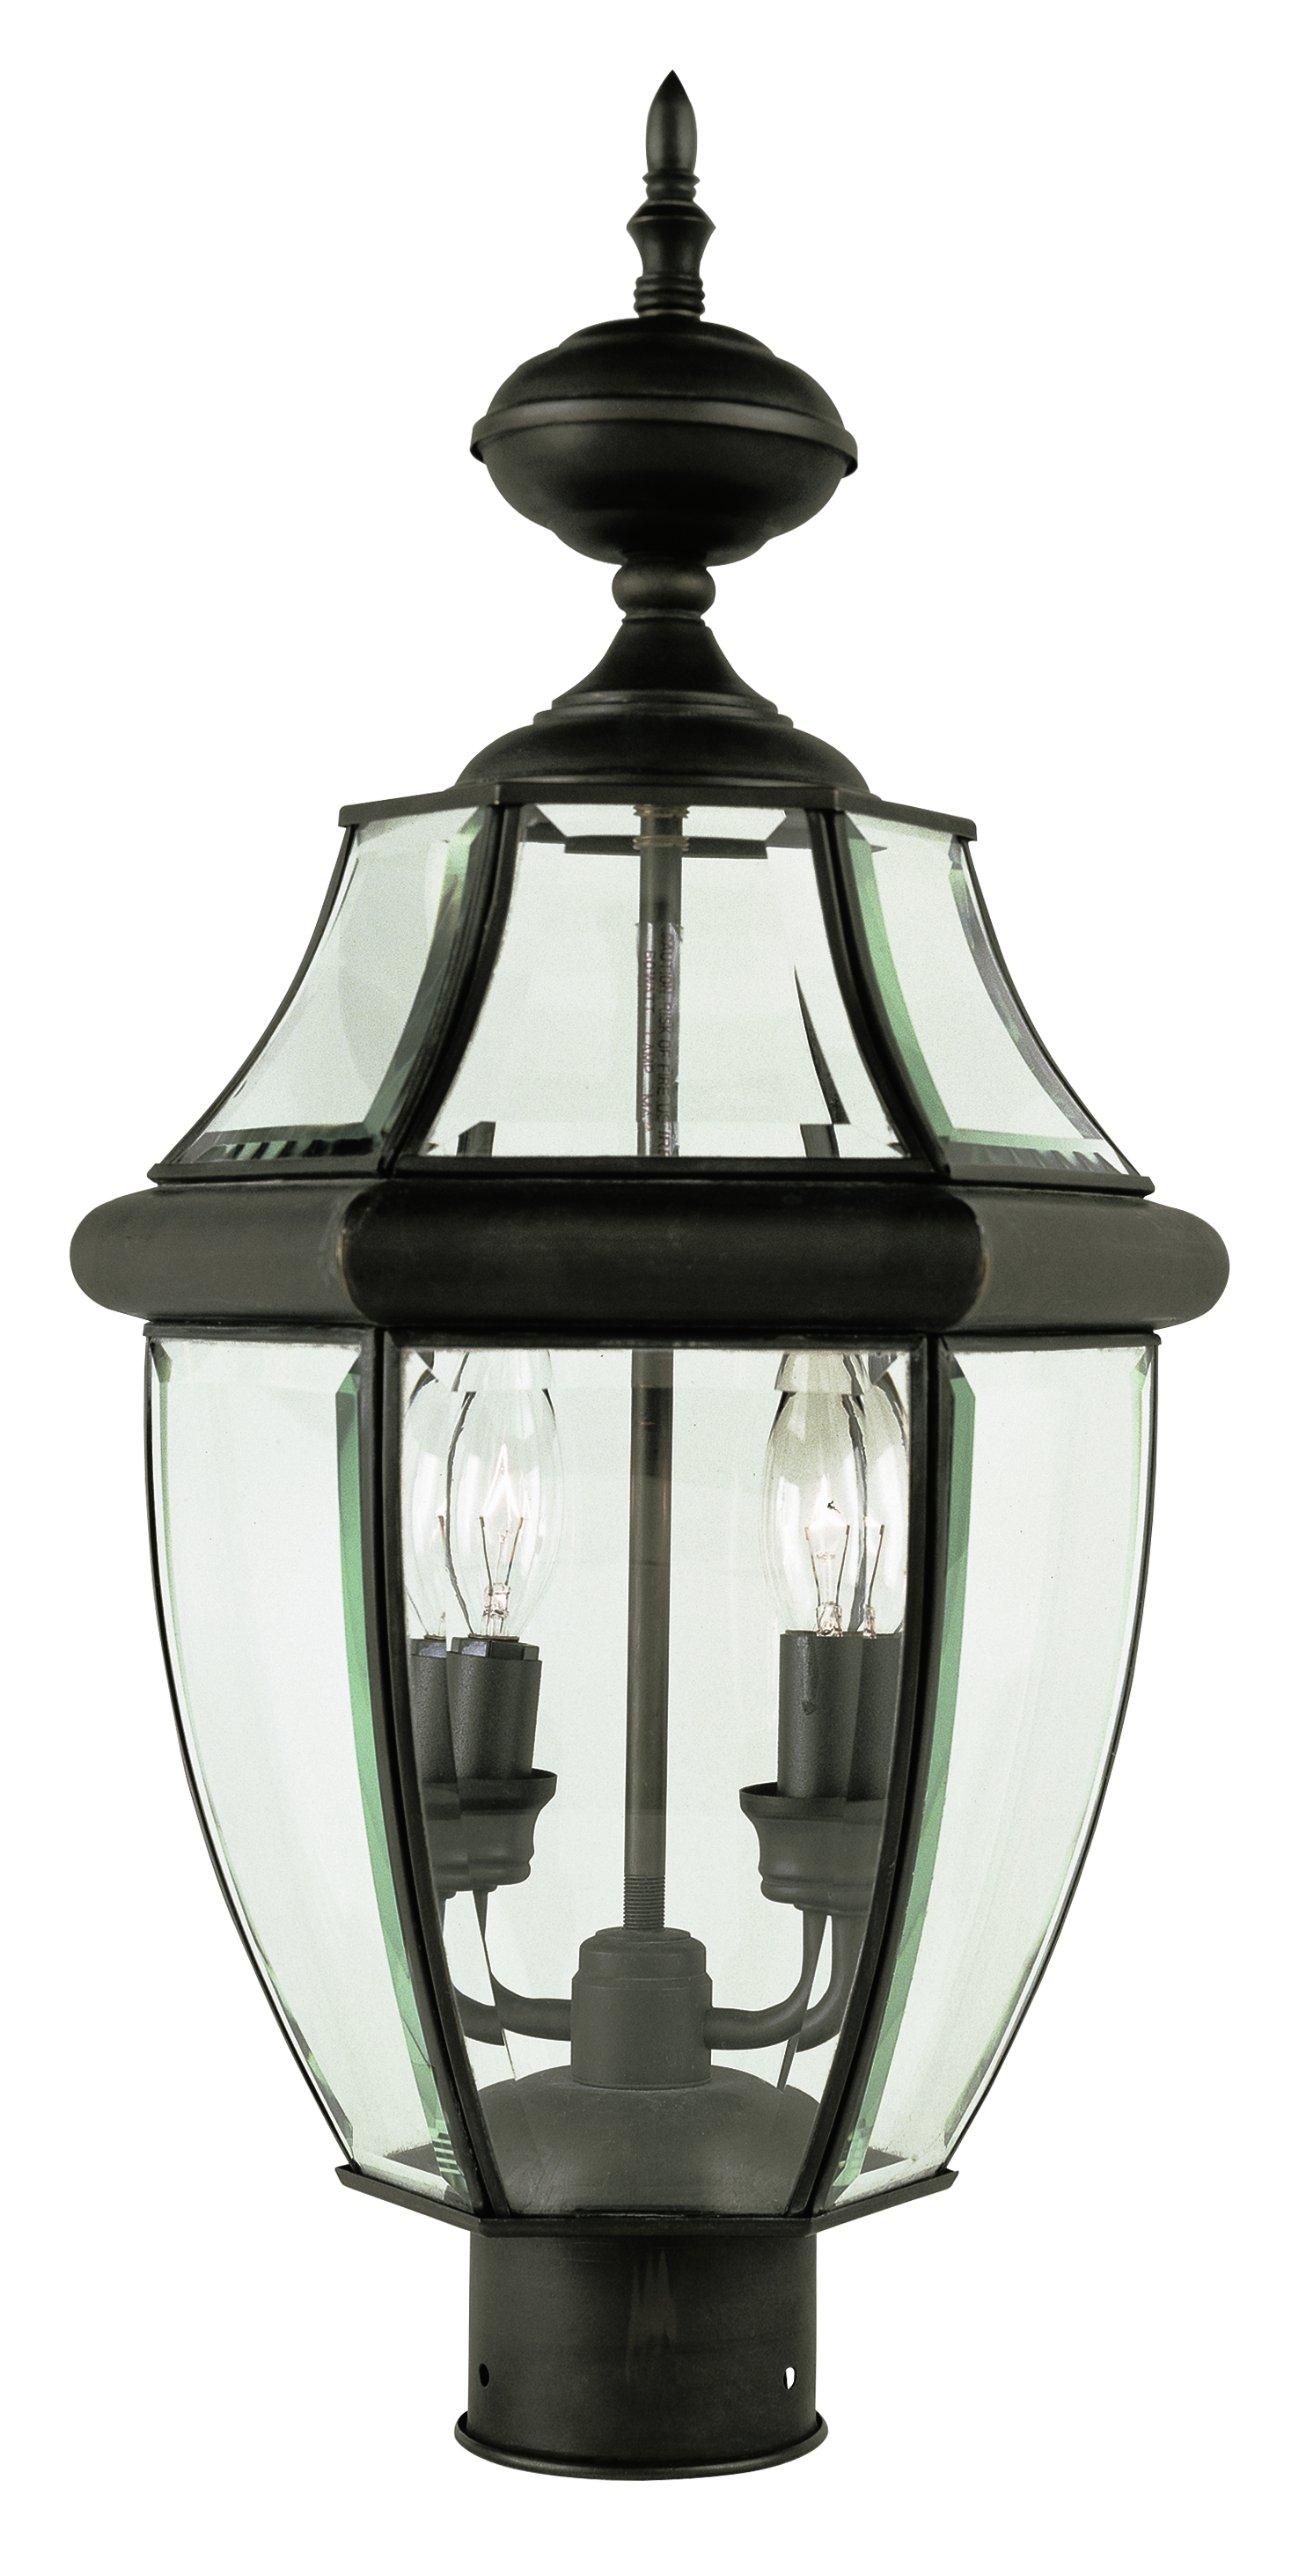 Trans Globe Lighting 4321 WB Outdoor Courtyard 21.5'' Postmount Lantern, Weathered Bronze